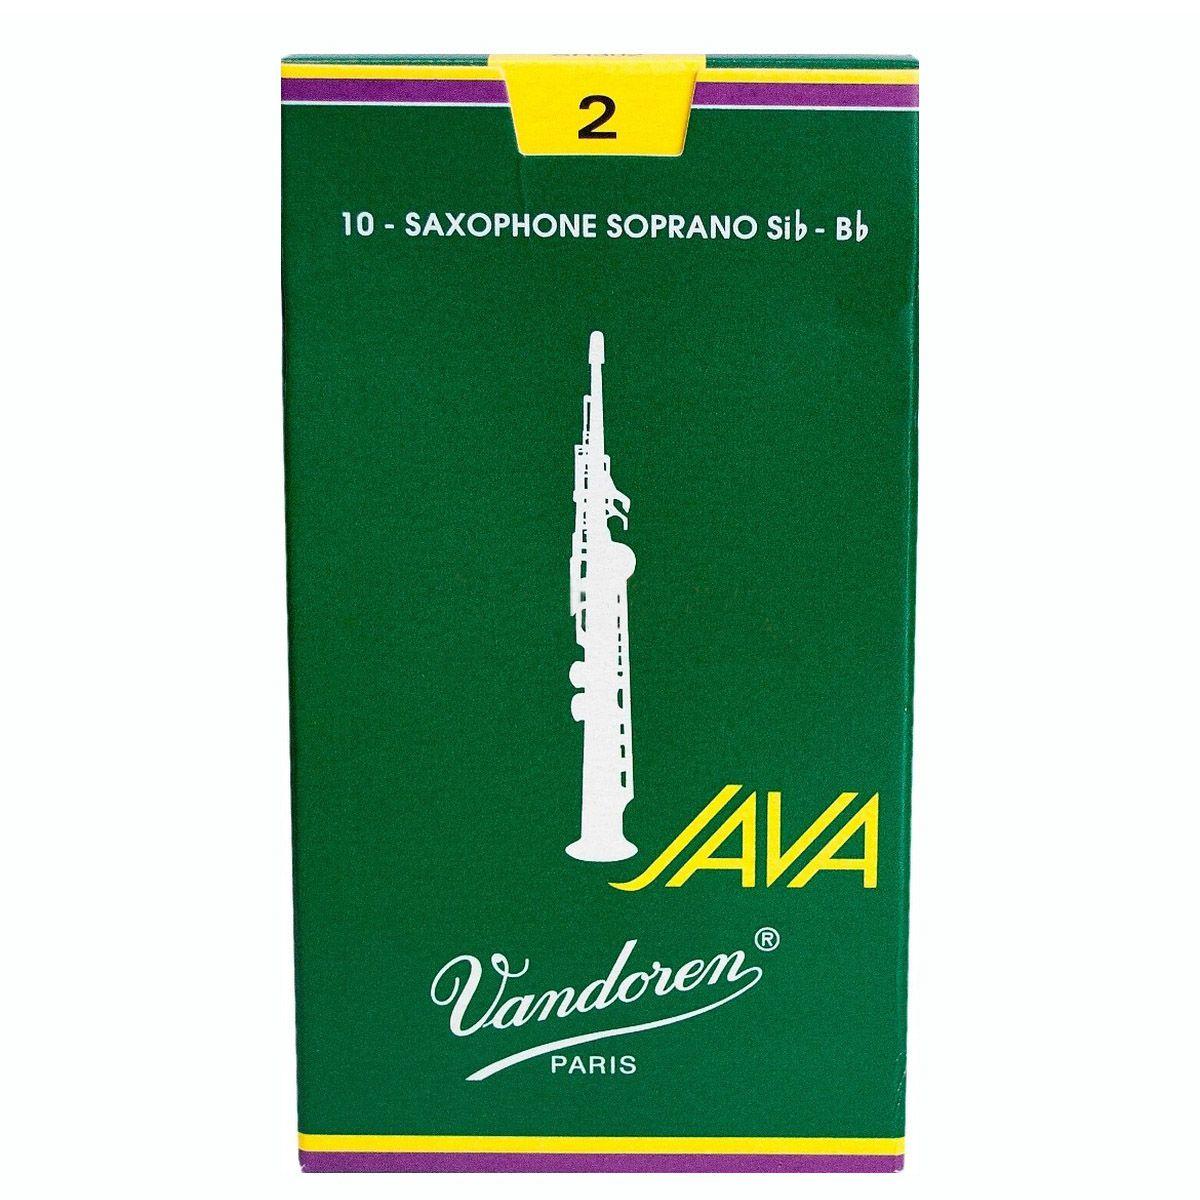 Palheta Vandoren Java Nº 2 para Sax Soprano